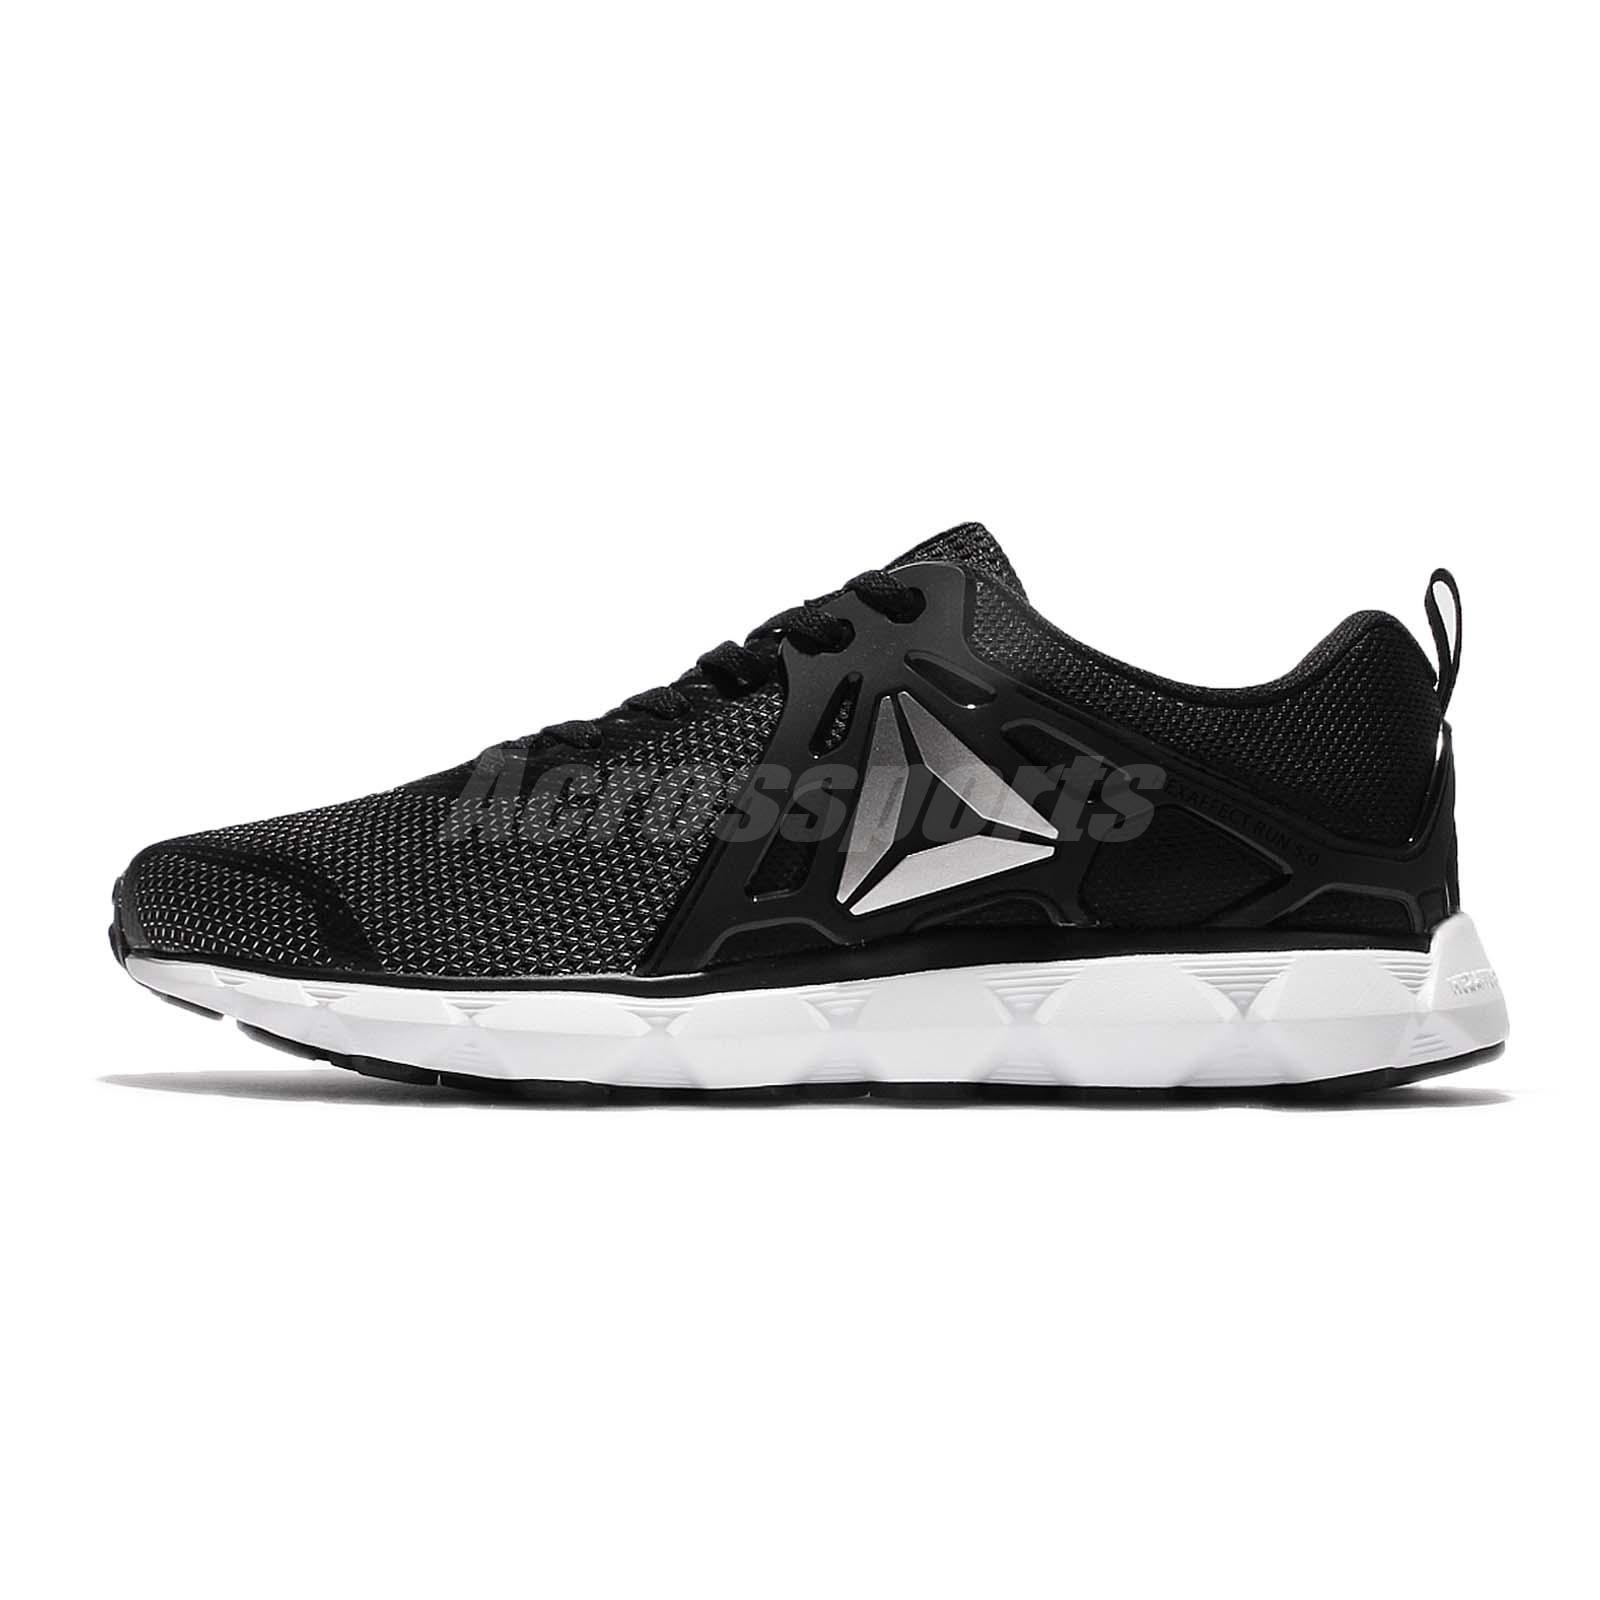 Reebok Hexafect Run 5.0 MTM Black Silver Men Running Shoes Sneakers BD4700 R1kssB2